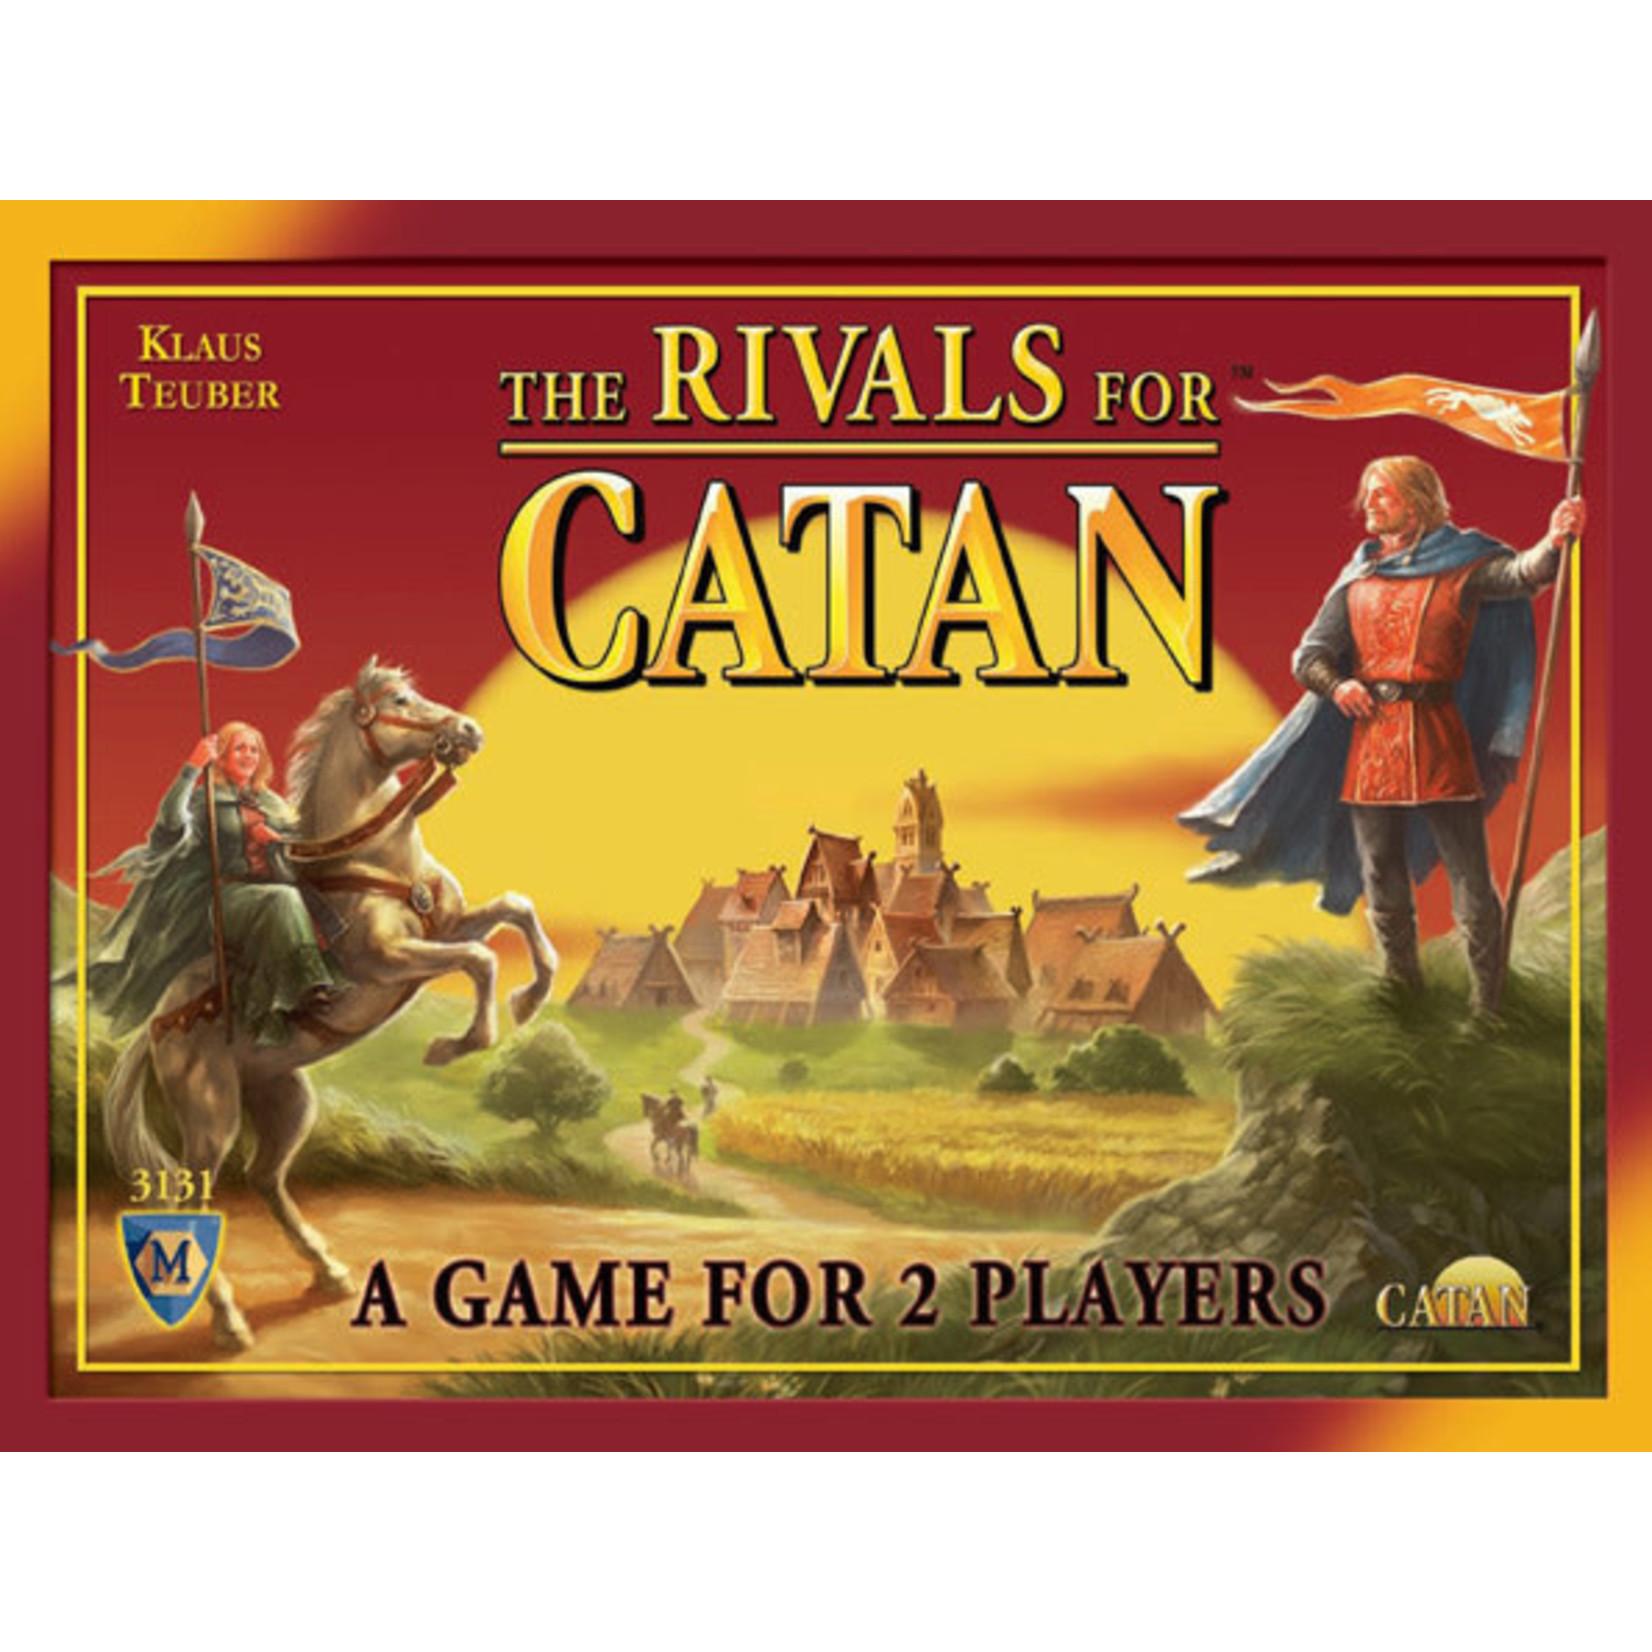 Catan Studio Catan: Rivals for Catan